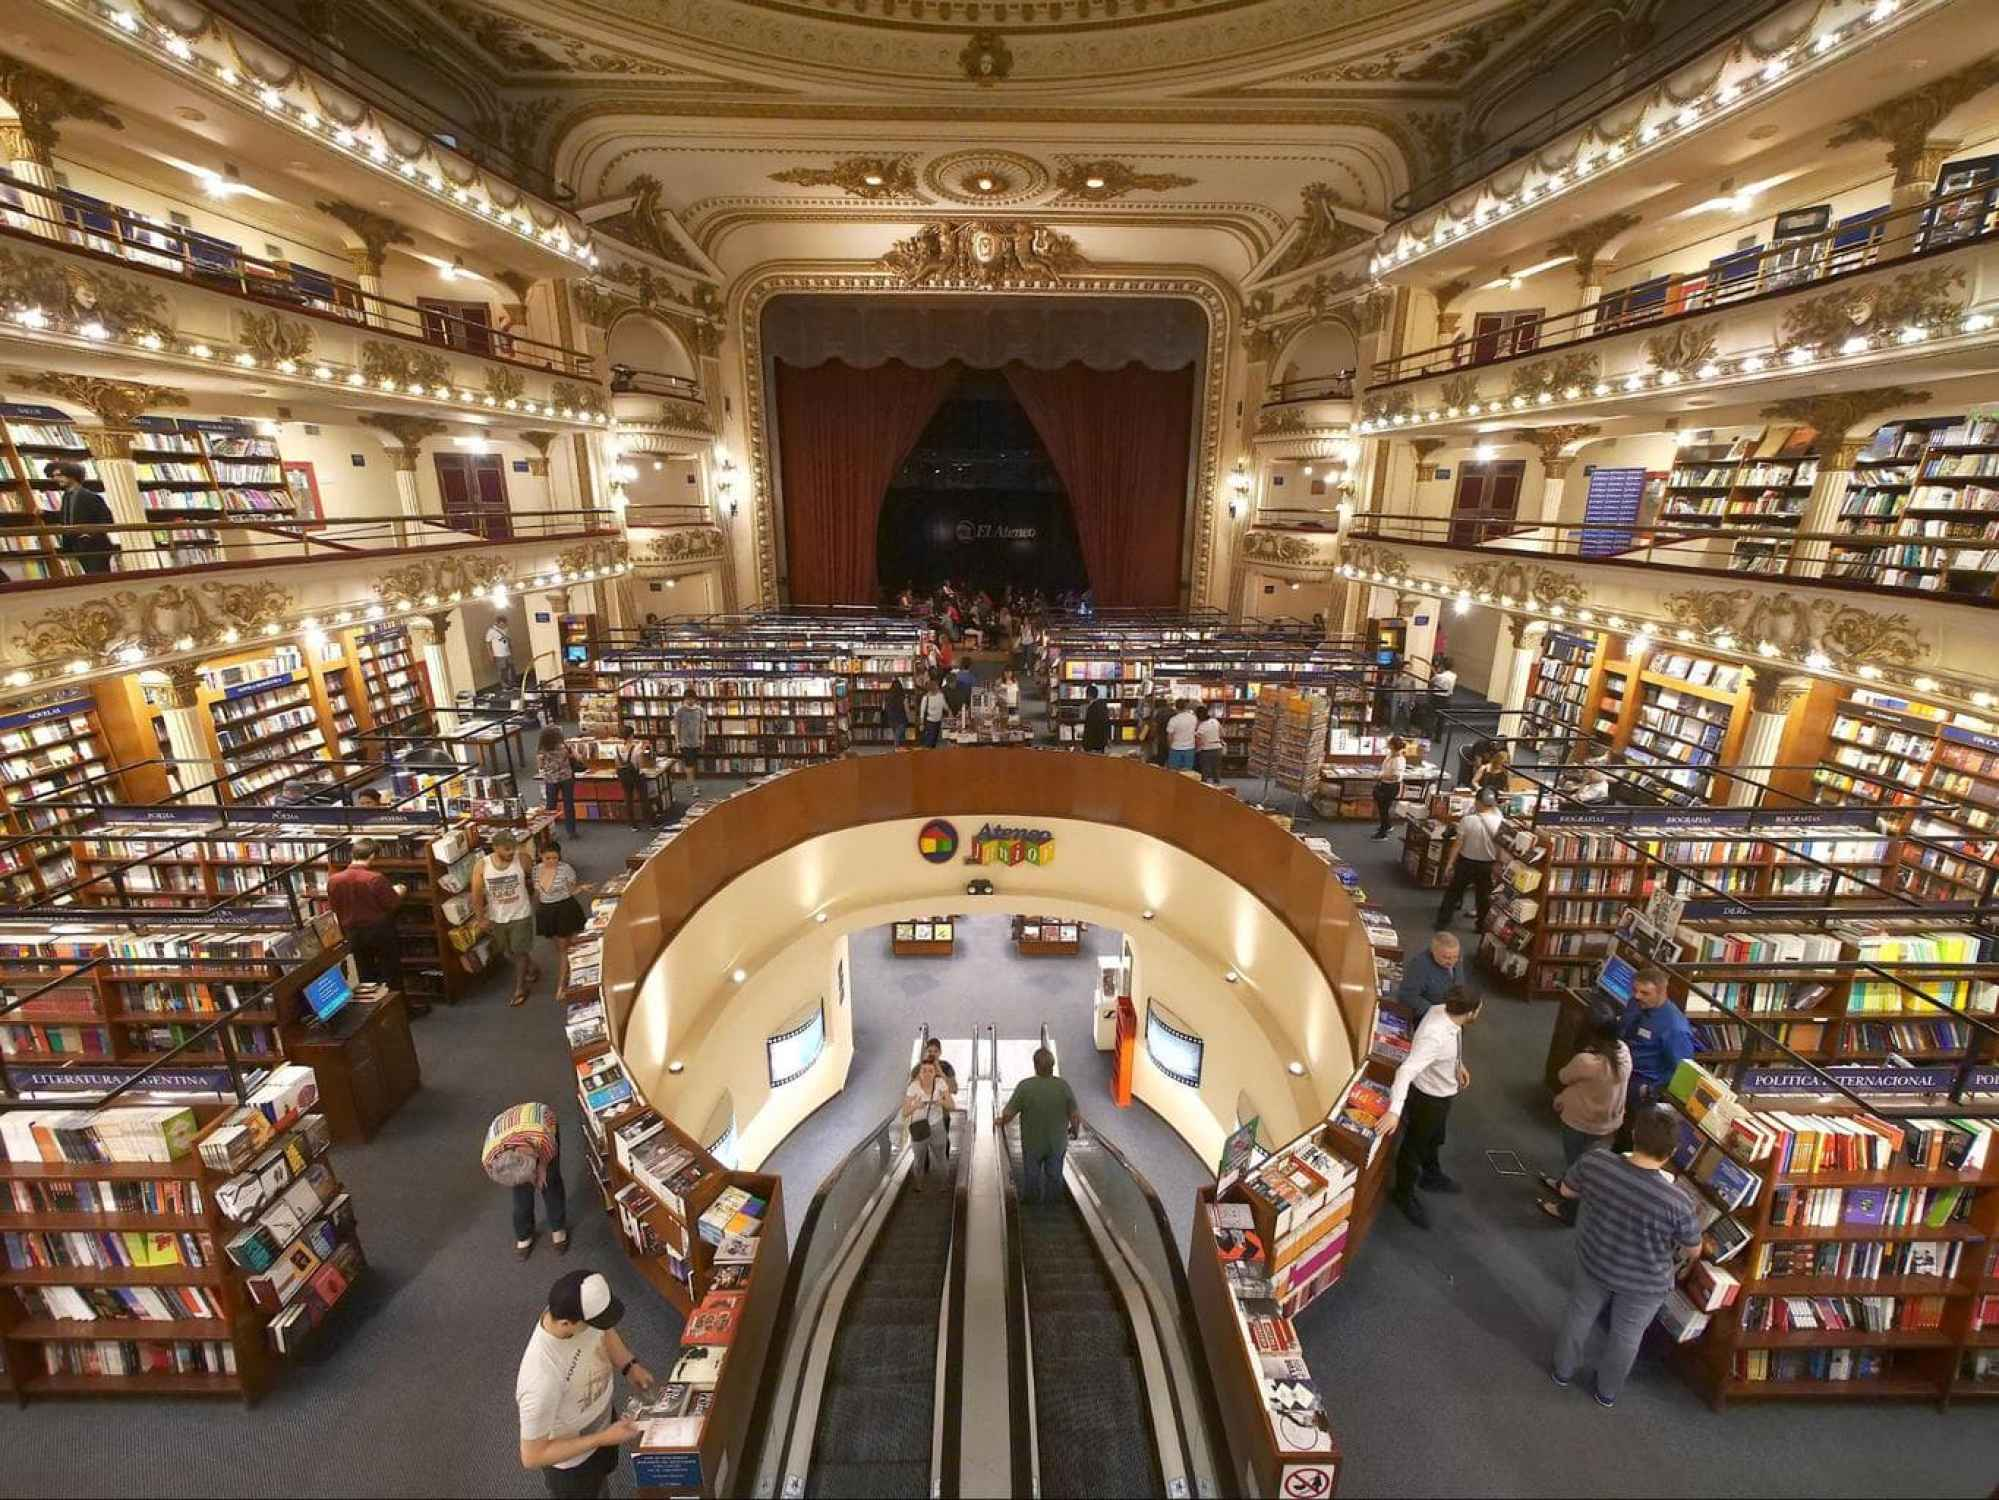 El Ateneo Grand Splendid interior